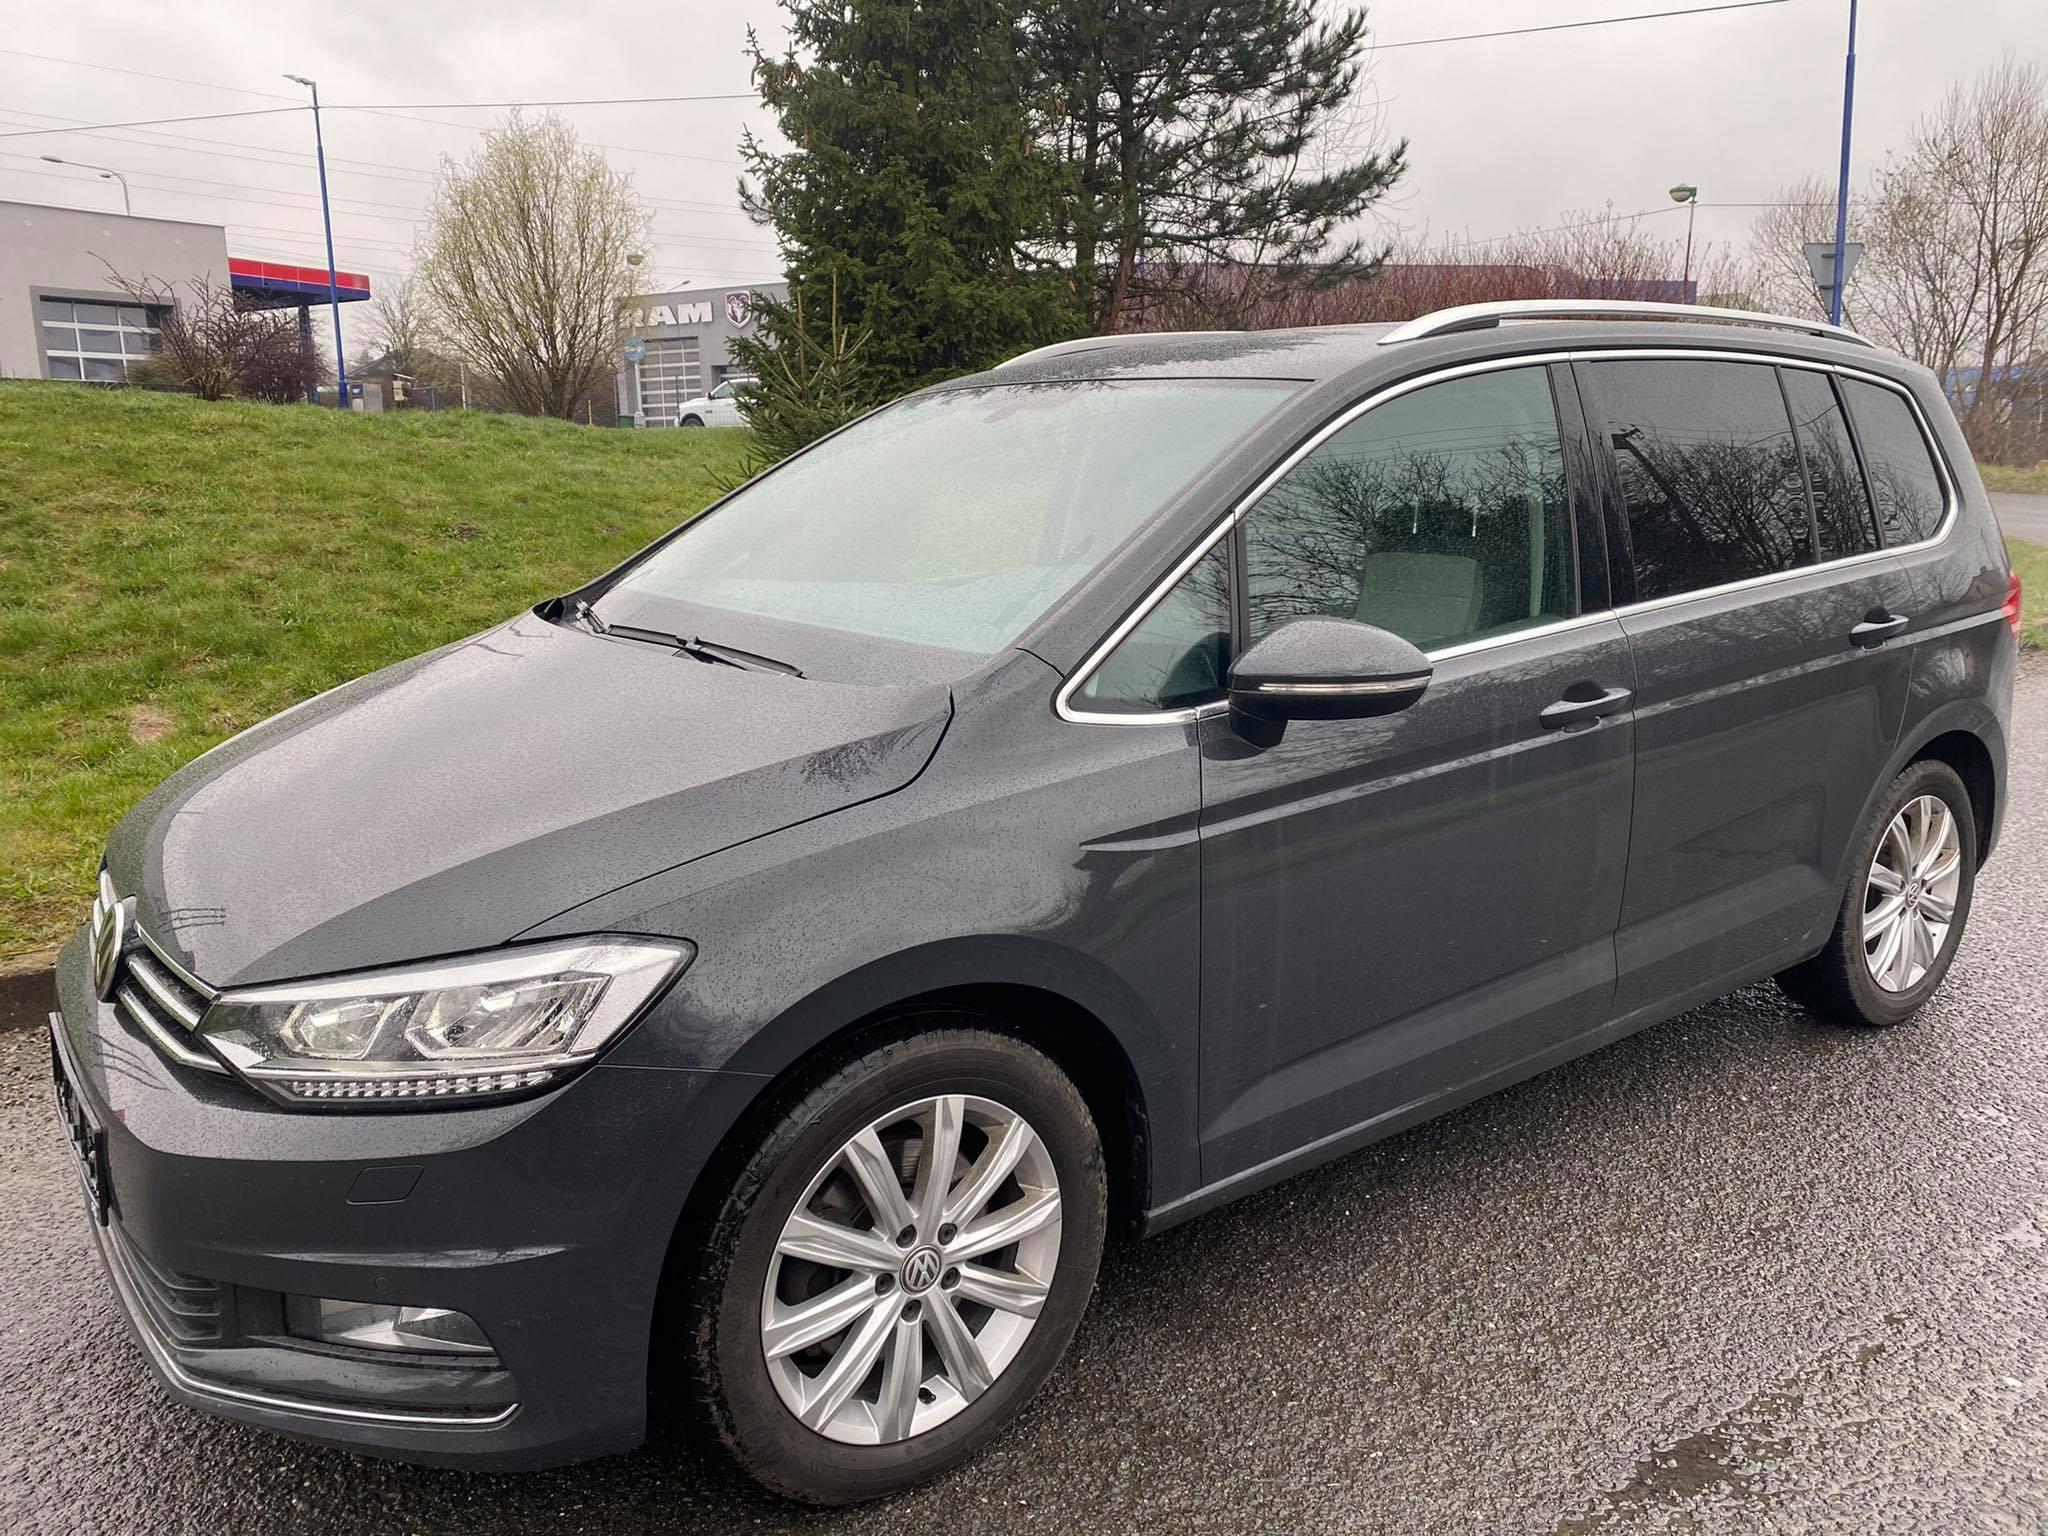 VW Touran 2,0TDi- 7.míst,alcantara,led